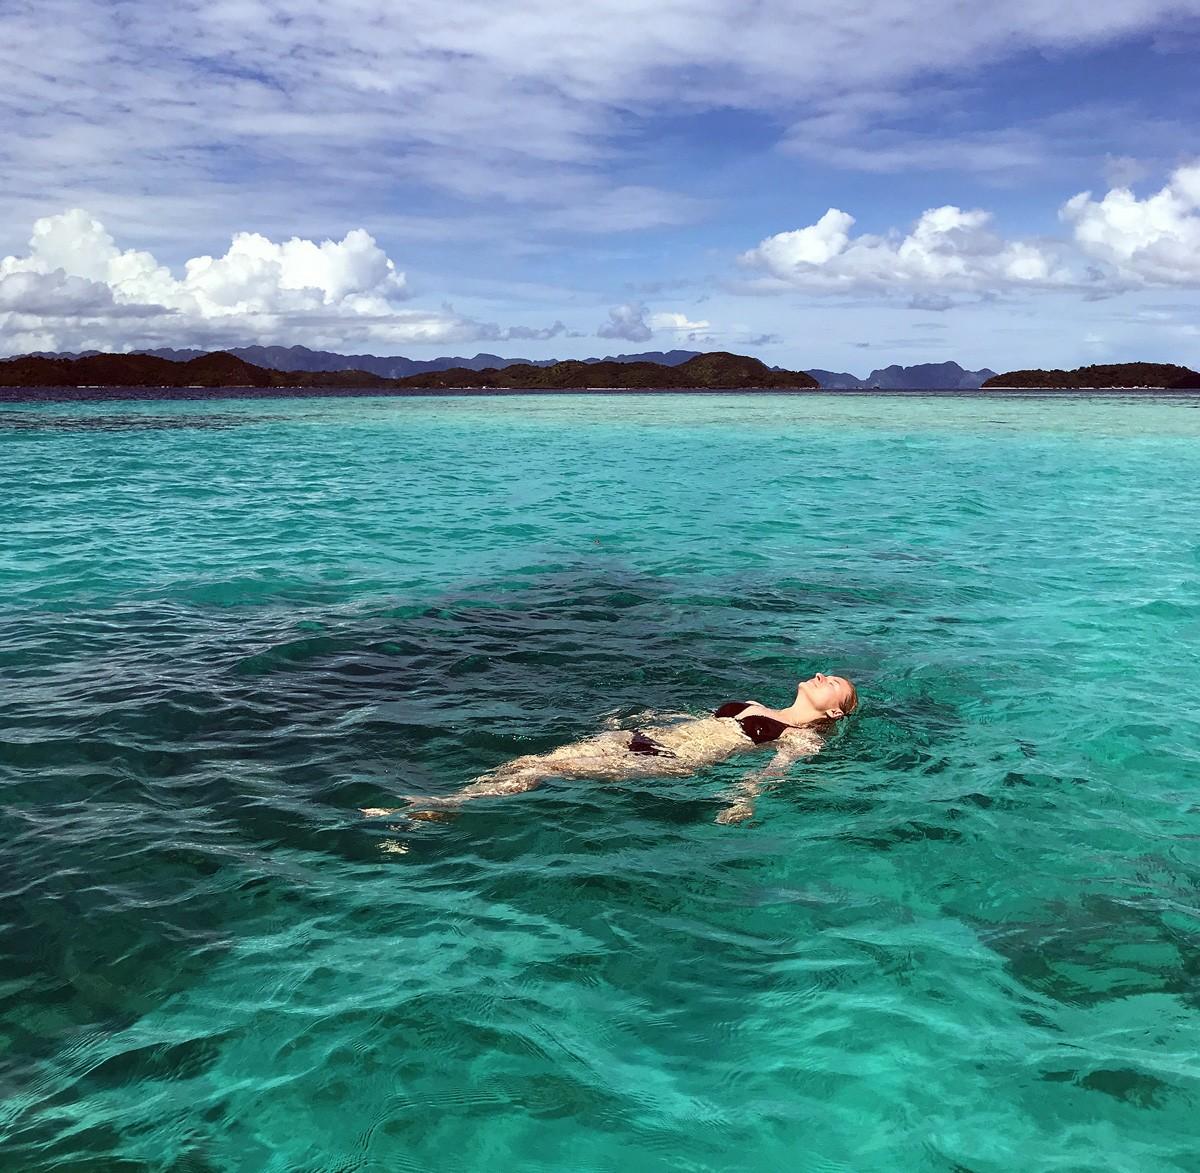 Nastia swim in the open sea, Palawan - Travelblogstories